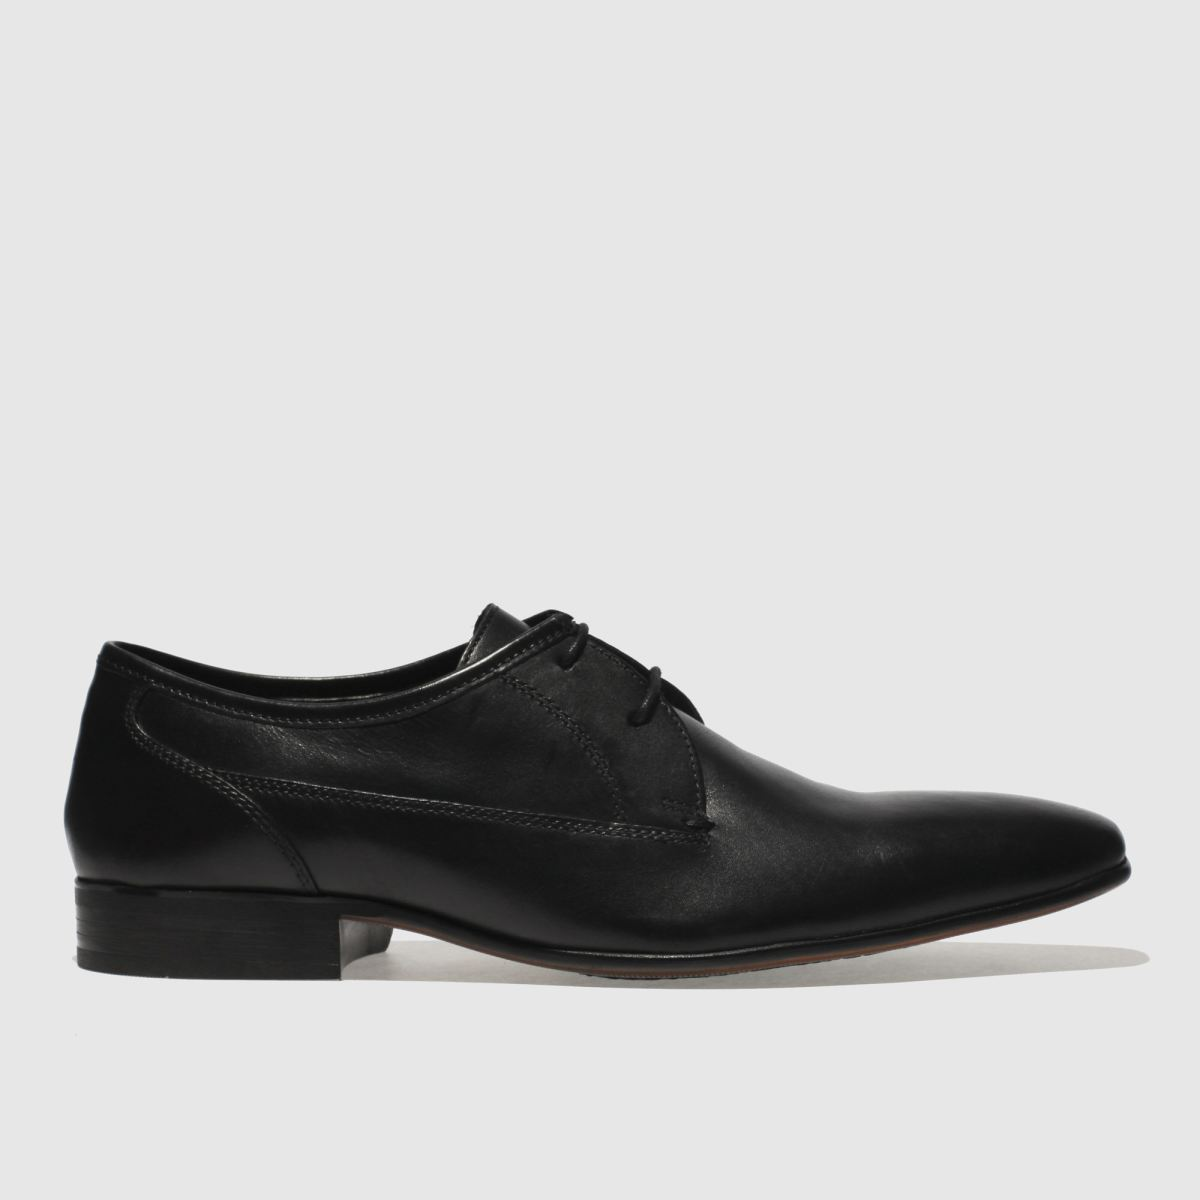 Ikon Ikon Black Bowles Gibson Shoes